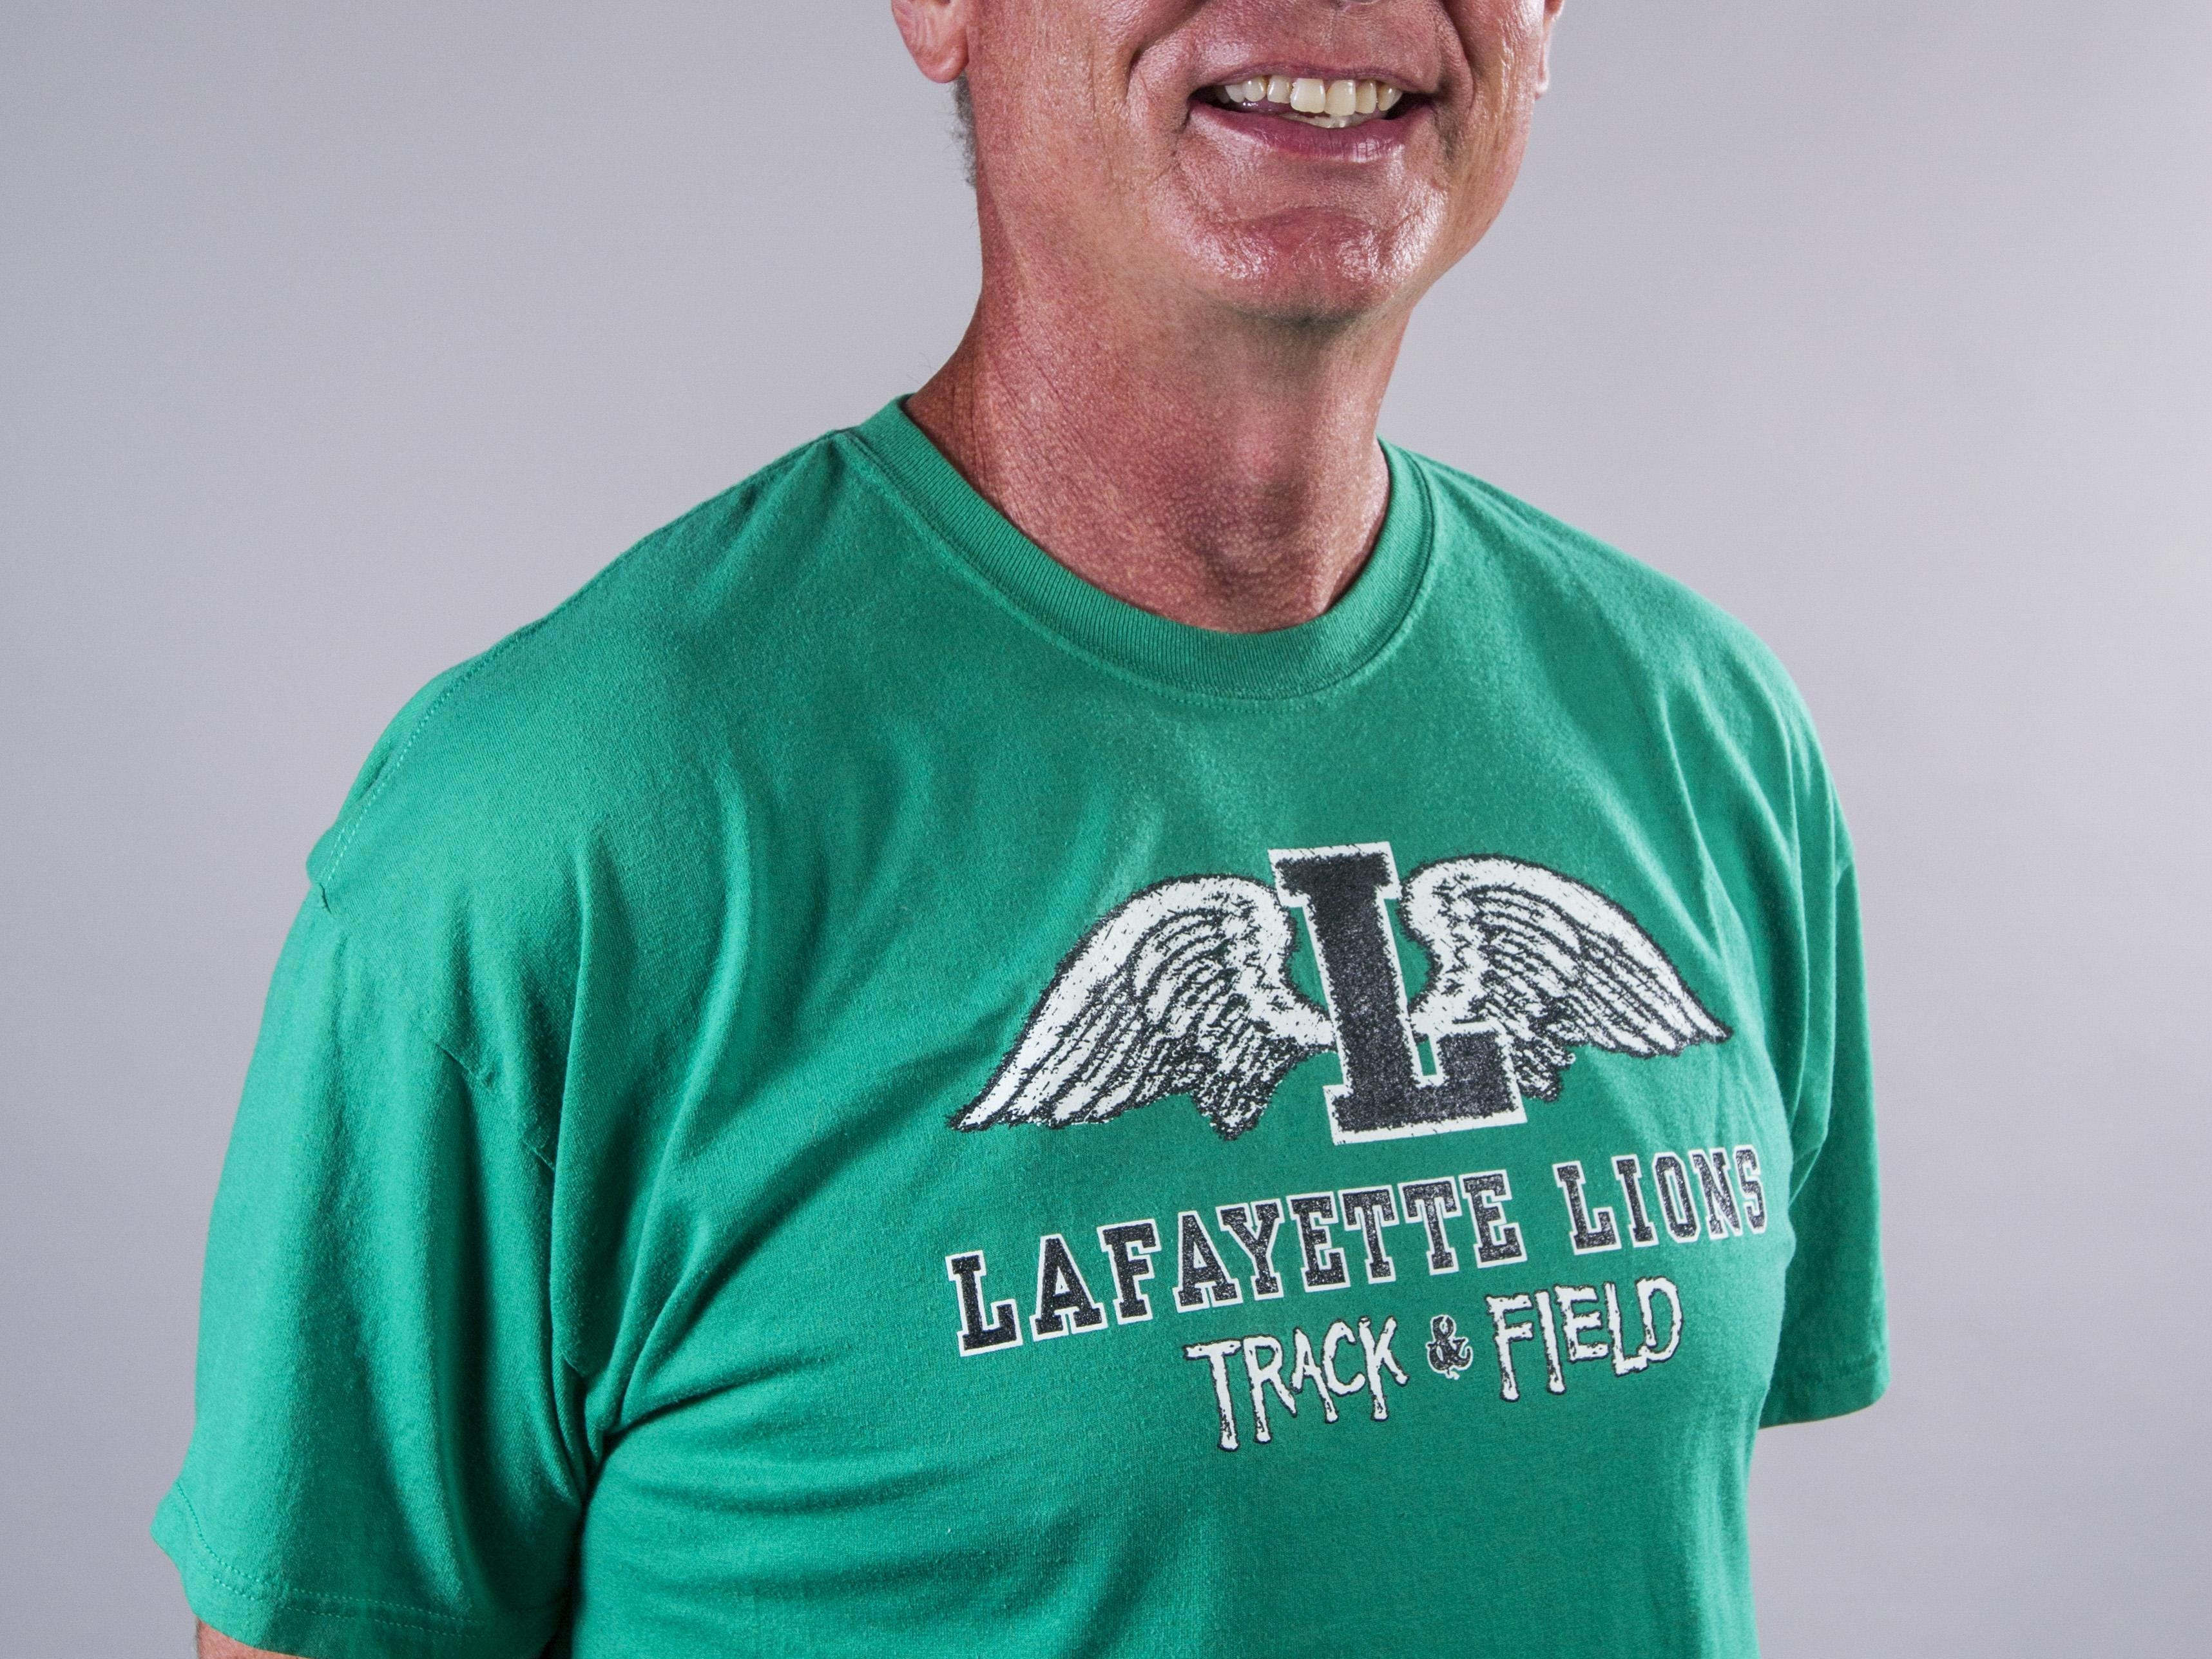 coach Ron Baillargeon, Lafayette High, All Acadiana Track & Field in Lafayette, La., Wednesday, June 24, 2015.